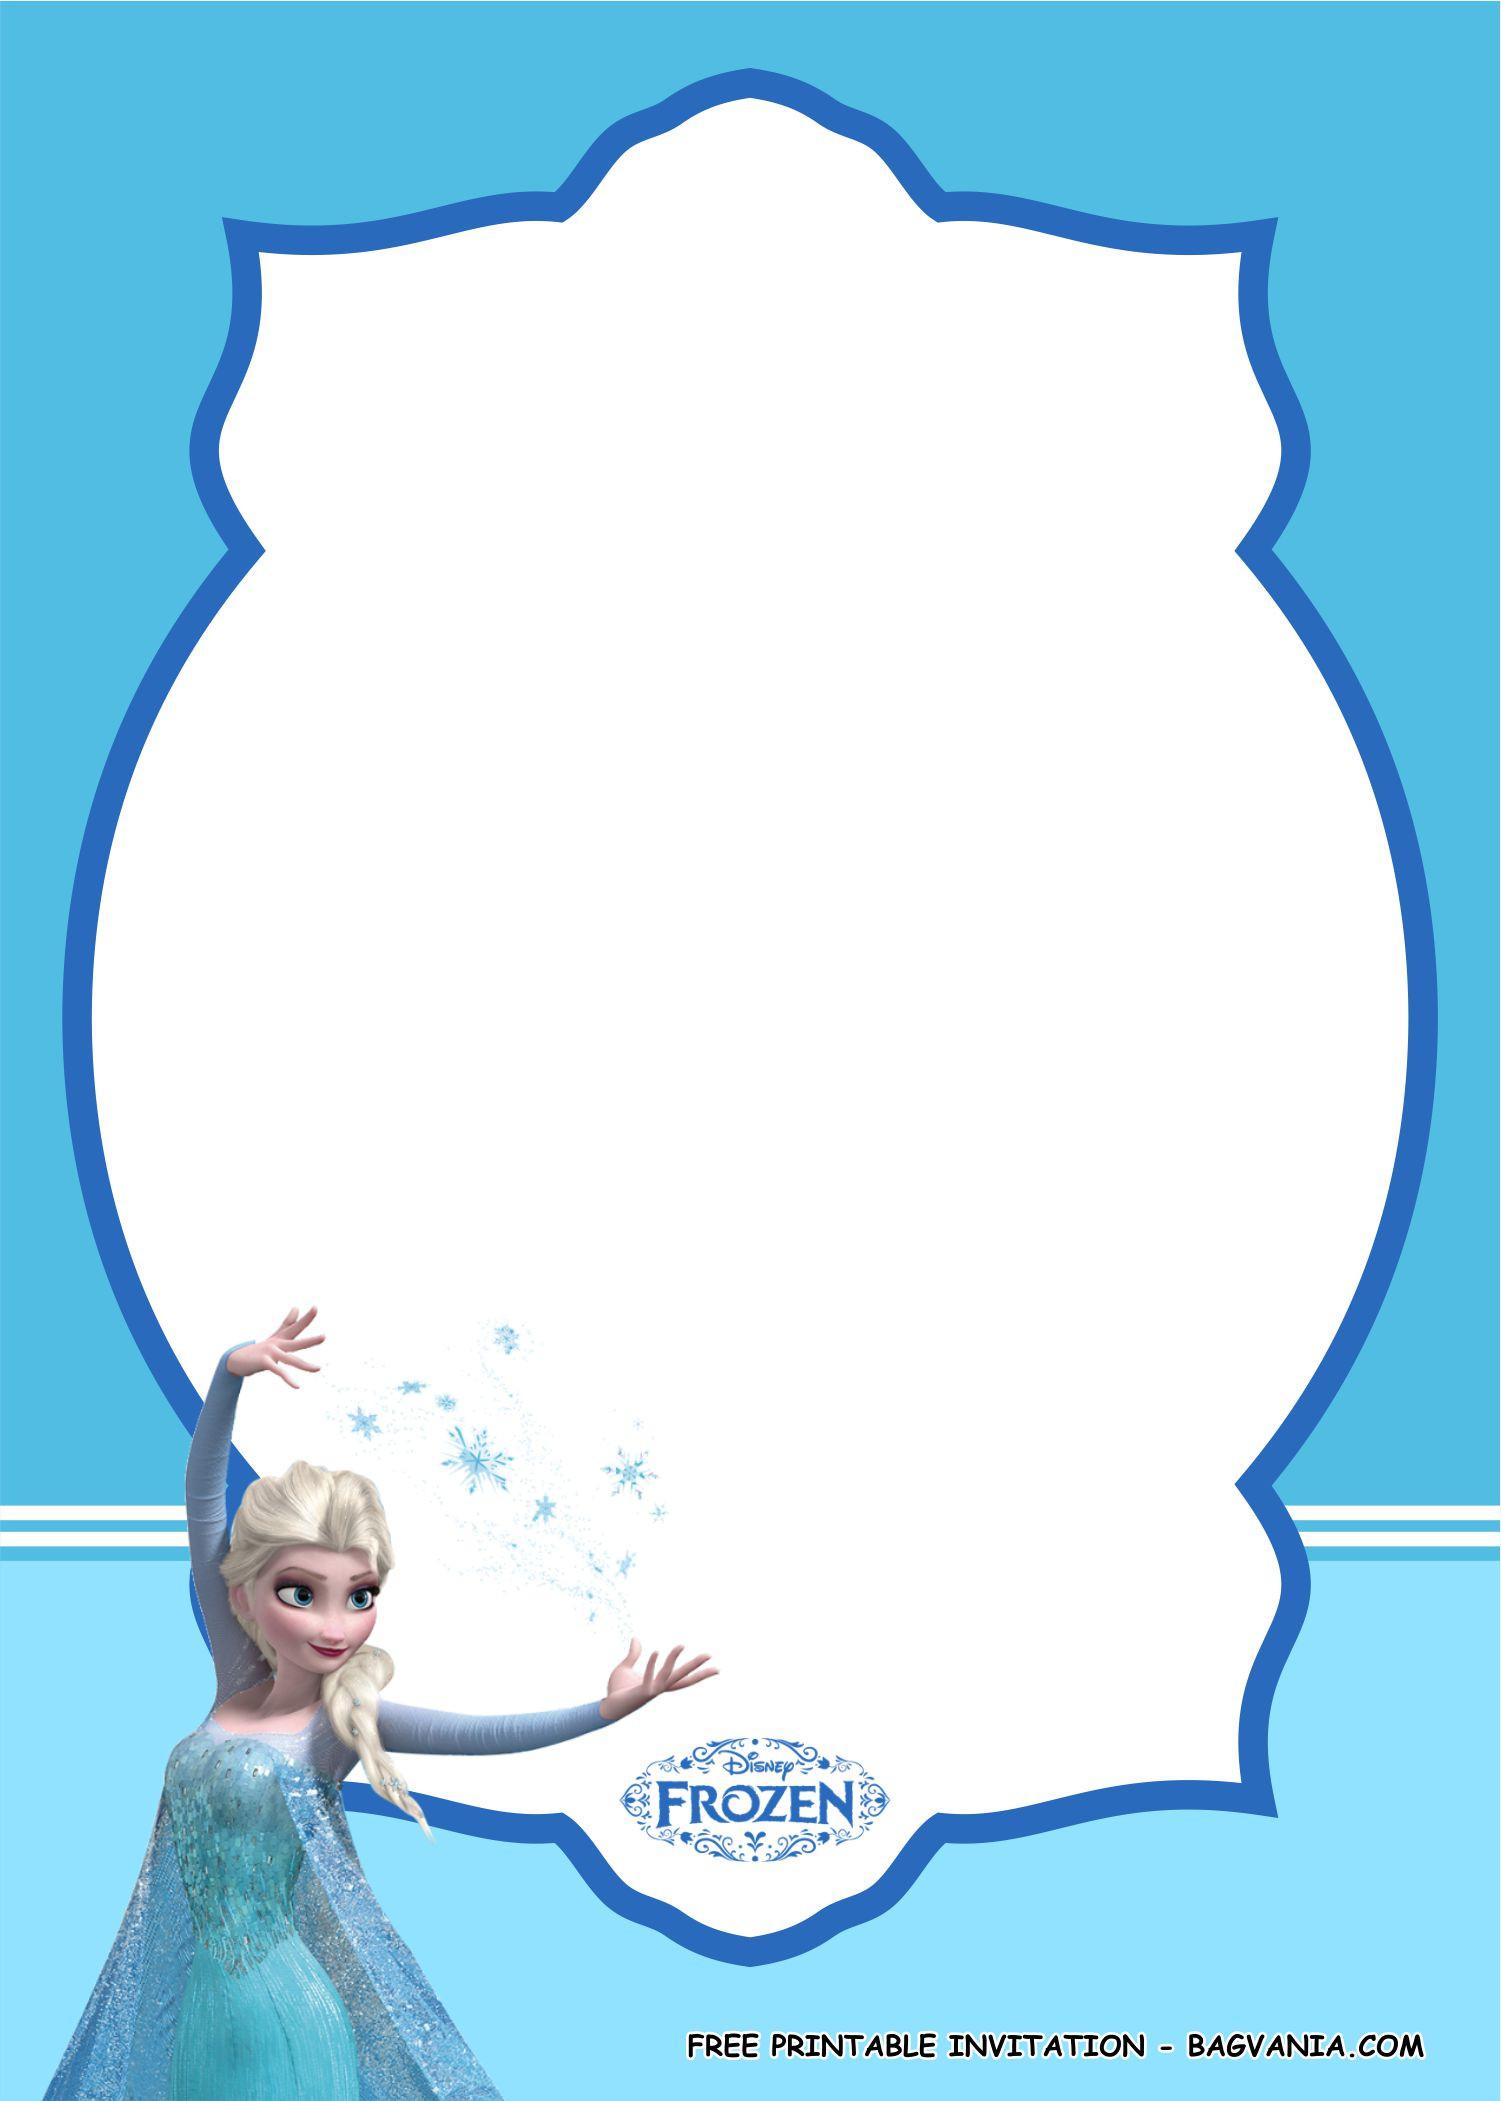 Free Frozen Invitations Printable Free Printable Amazing Frozen Birthday Party Kits – Free